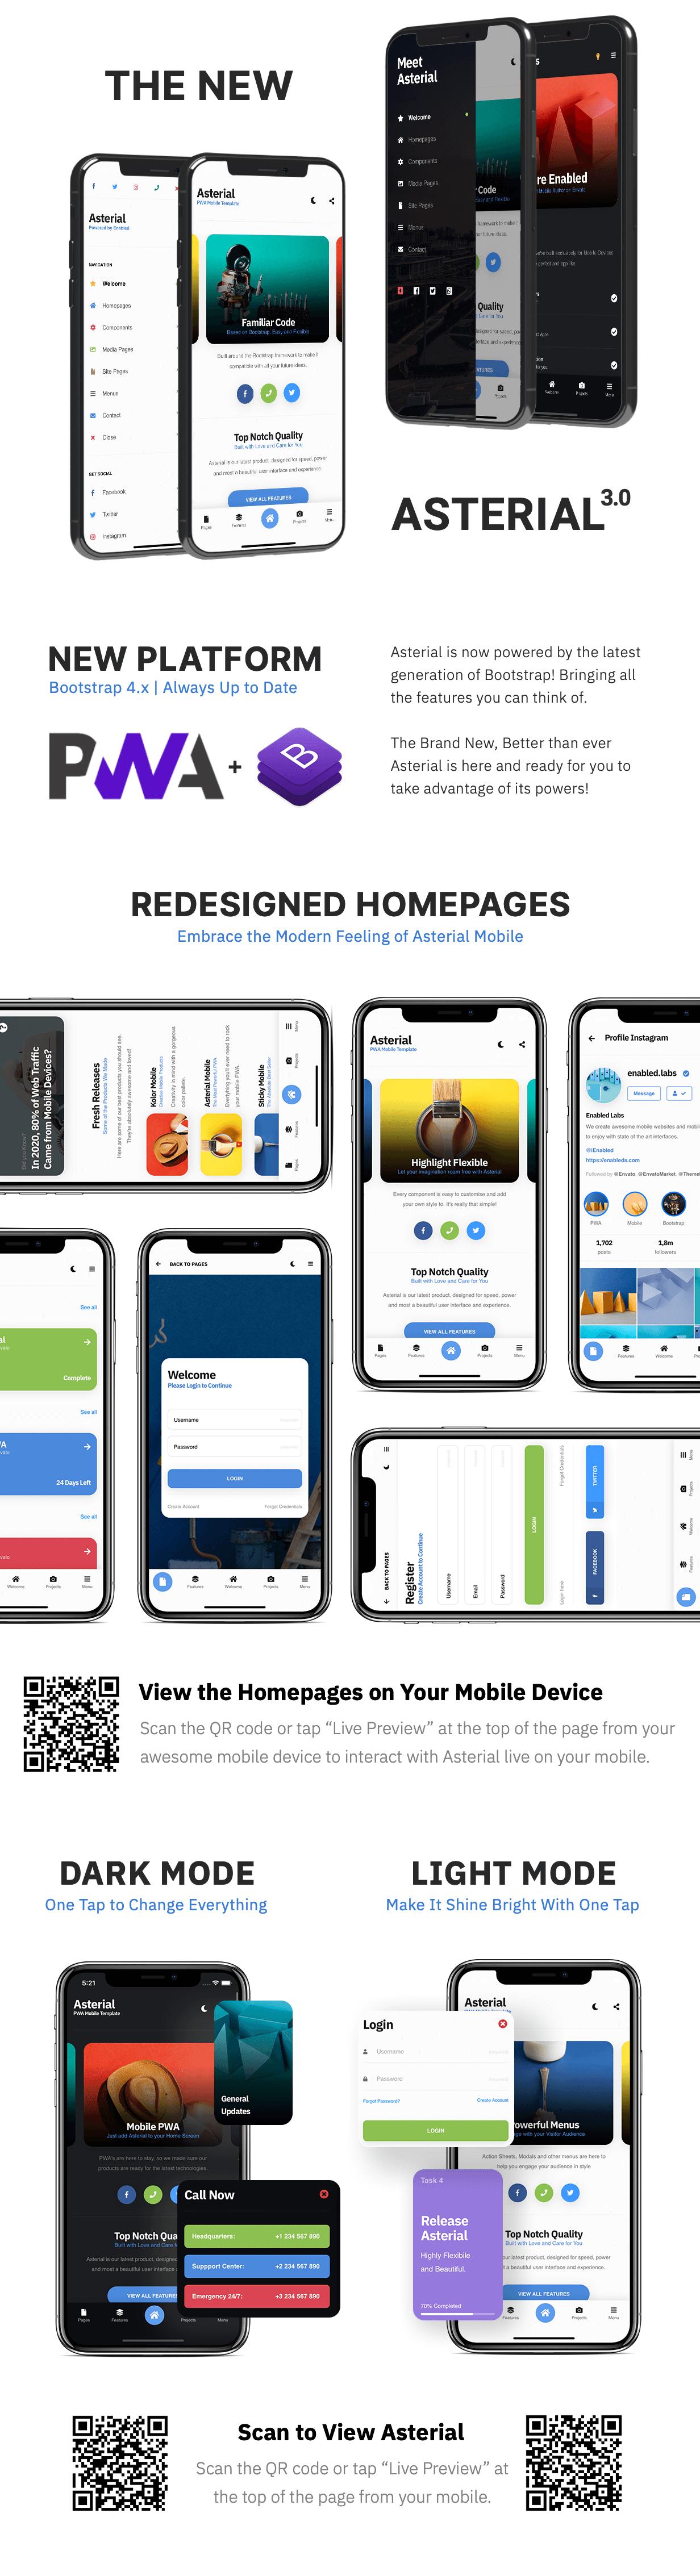 asterial1 - Asterial Mobile